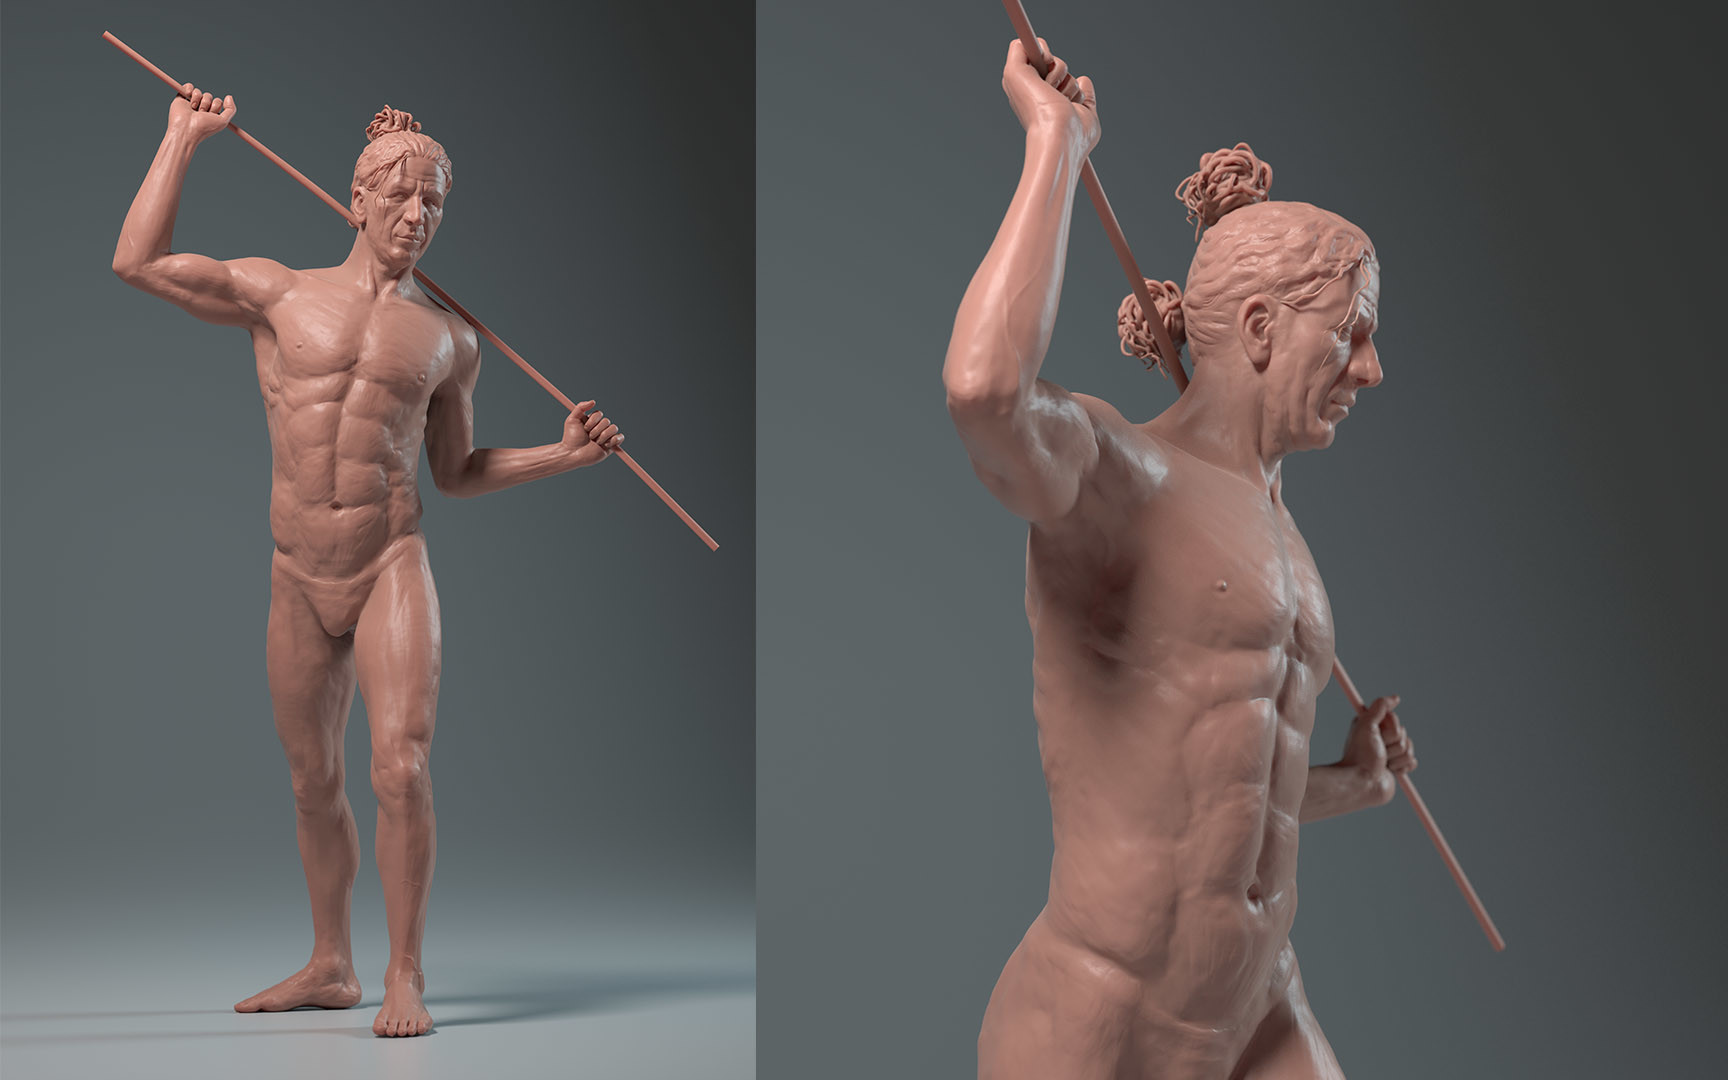 Carl christian gehl anatomystudy fullfigure front